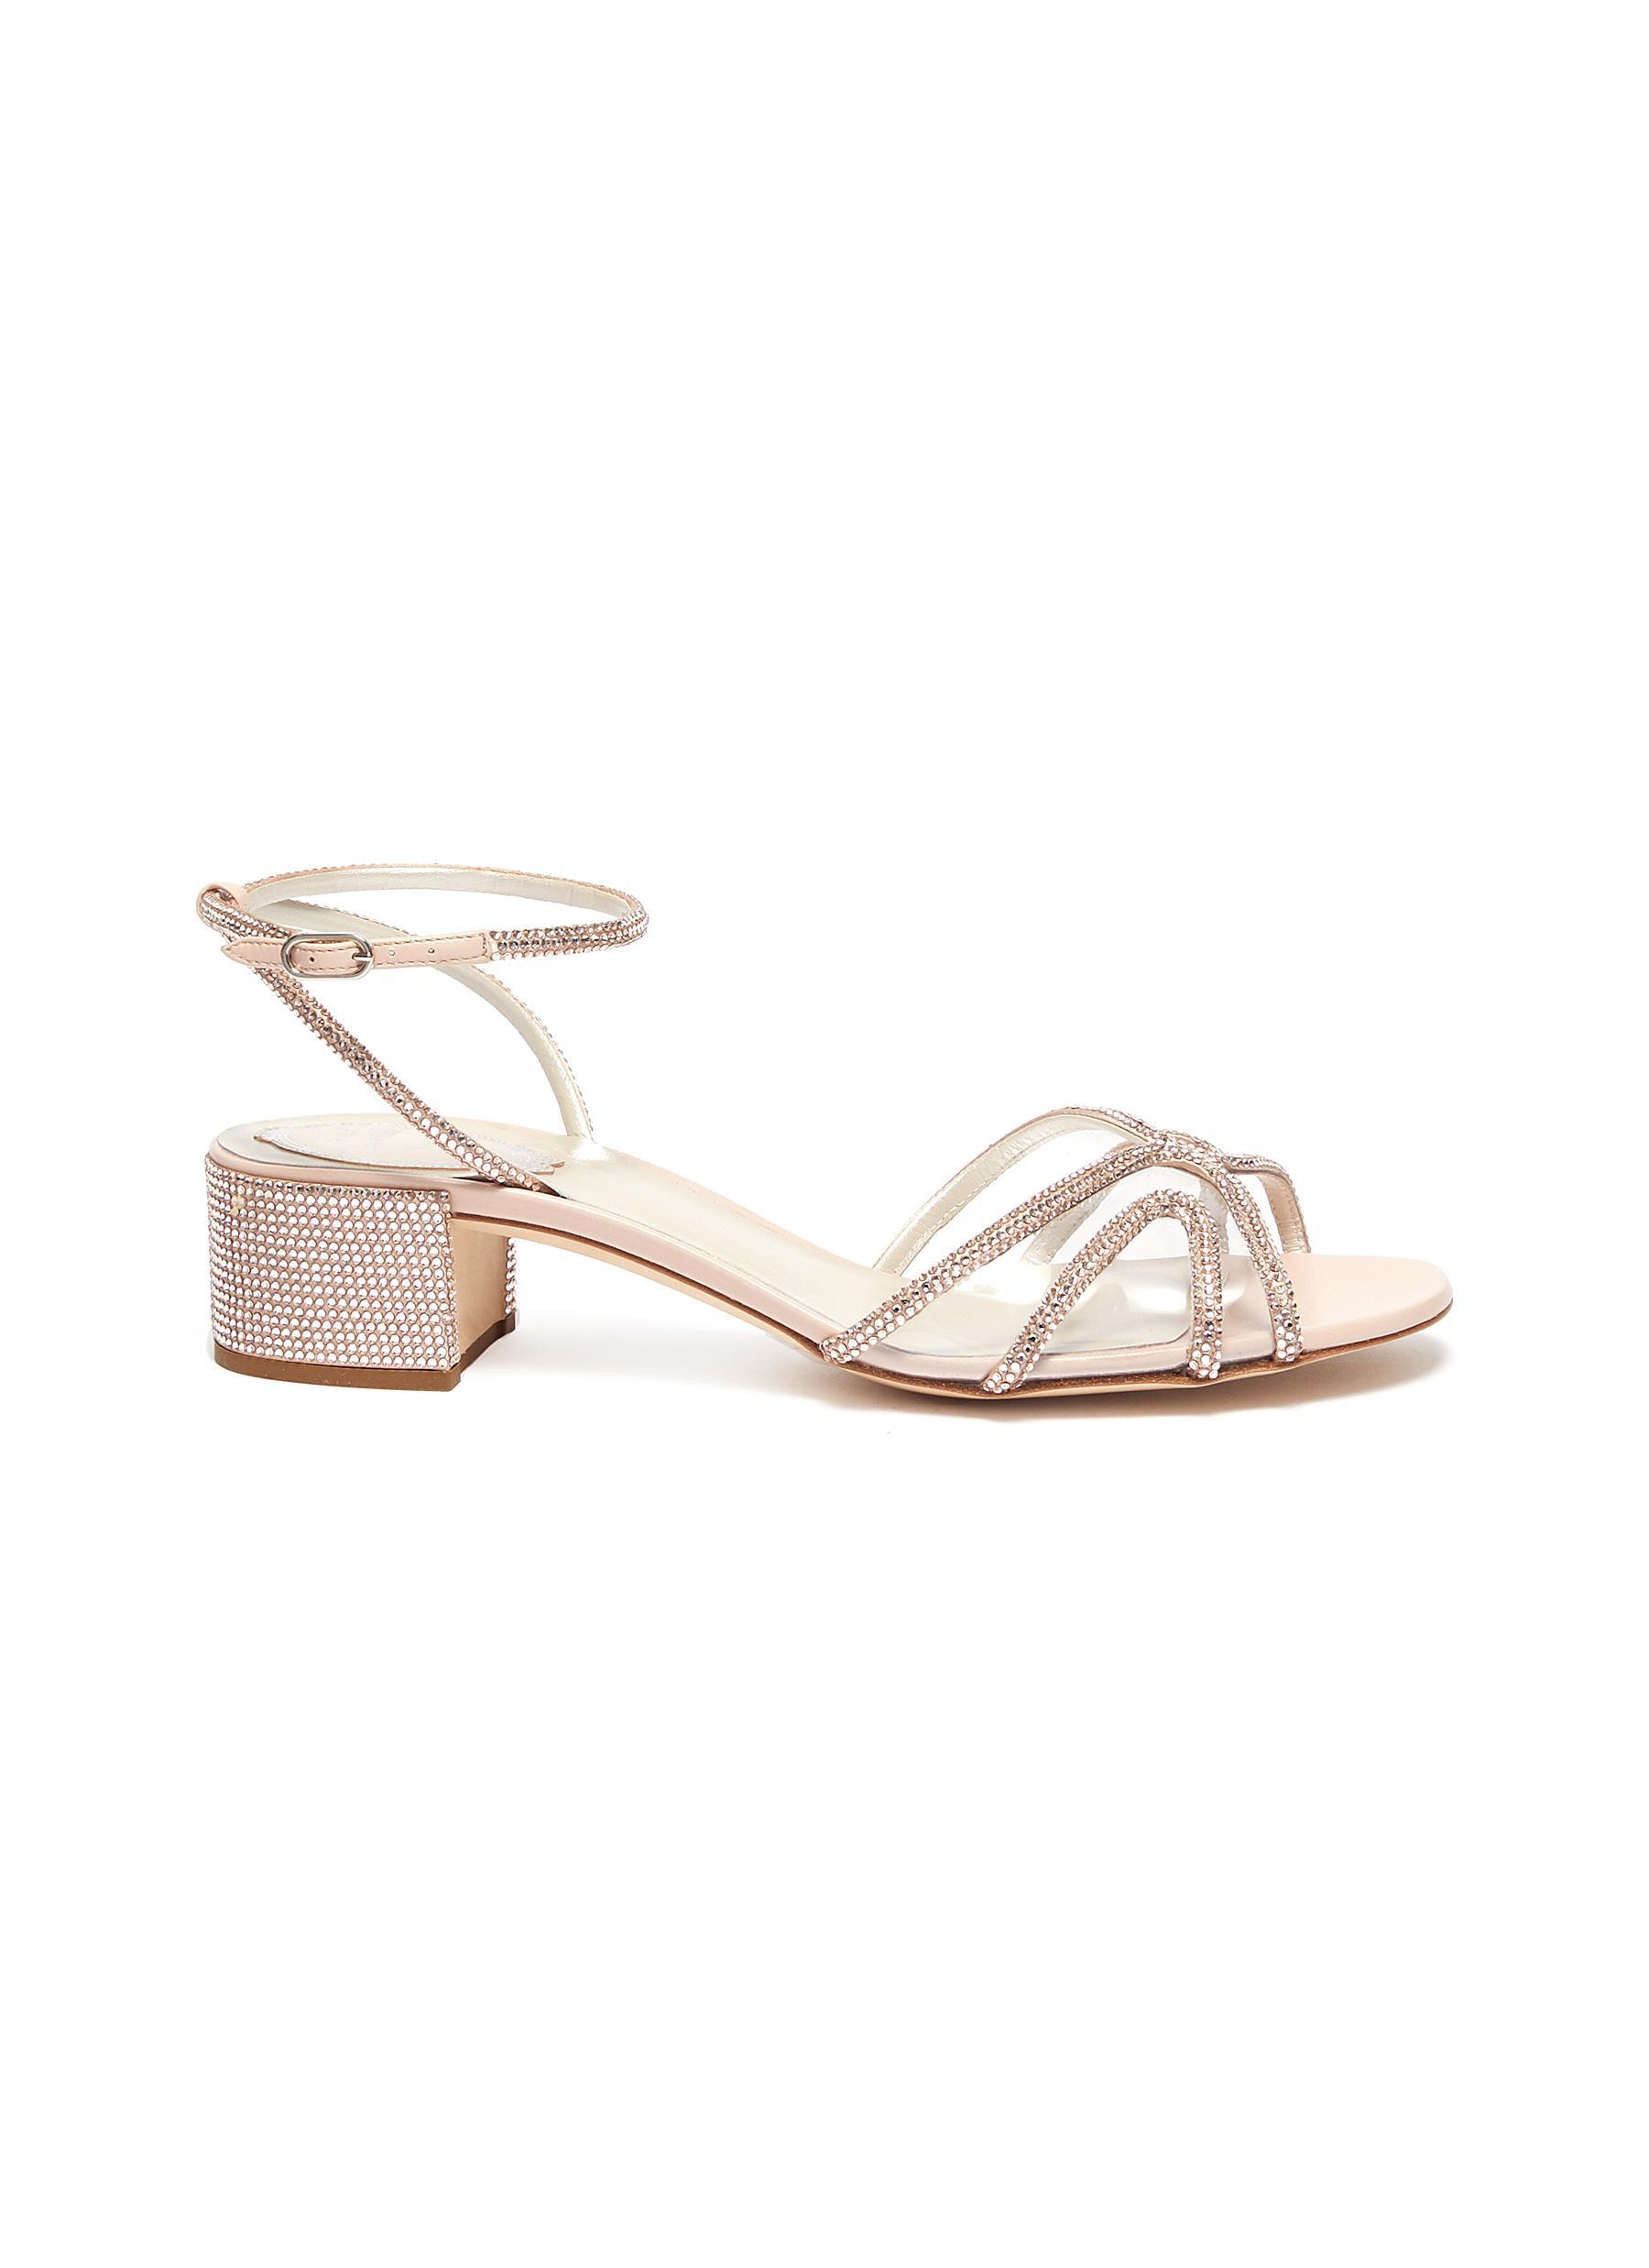 René Caovilla Low Heels Strass embellished satin block heel sandals